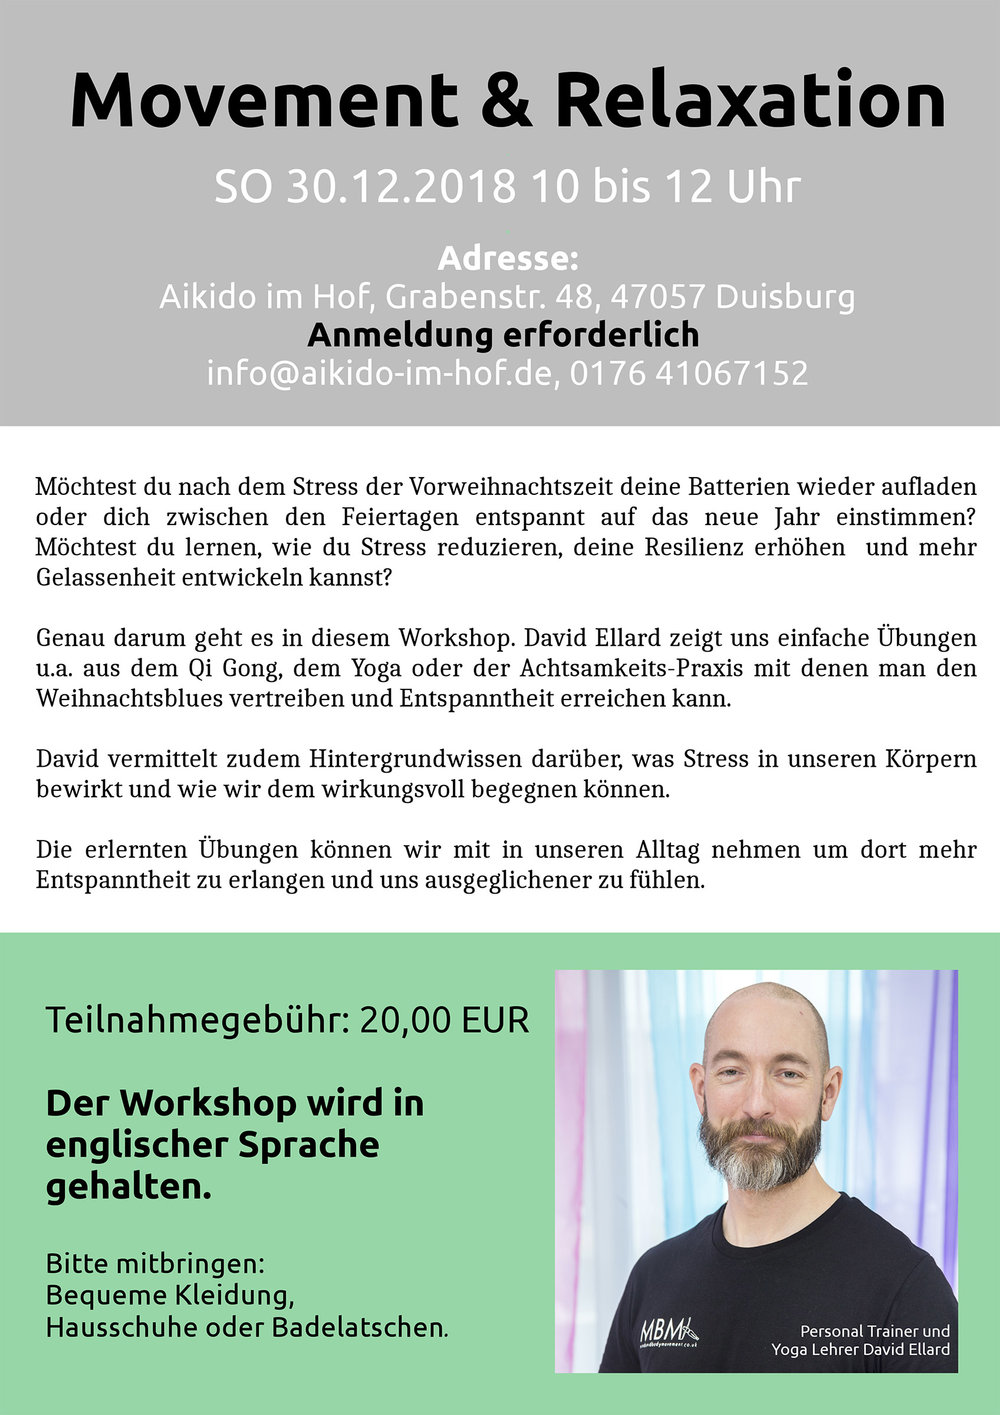 Druisburg Relax Word 2.jpg